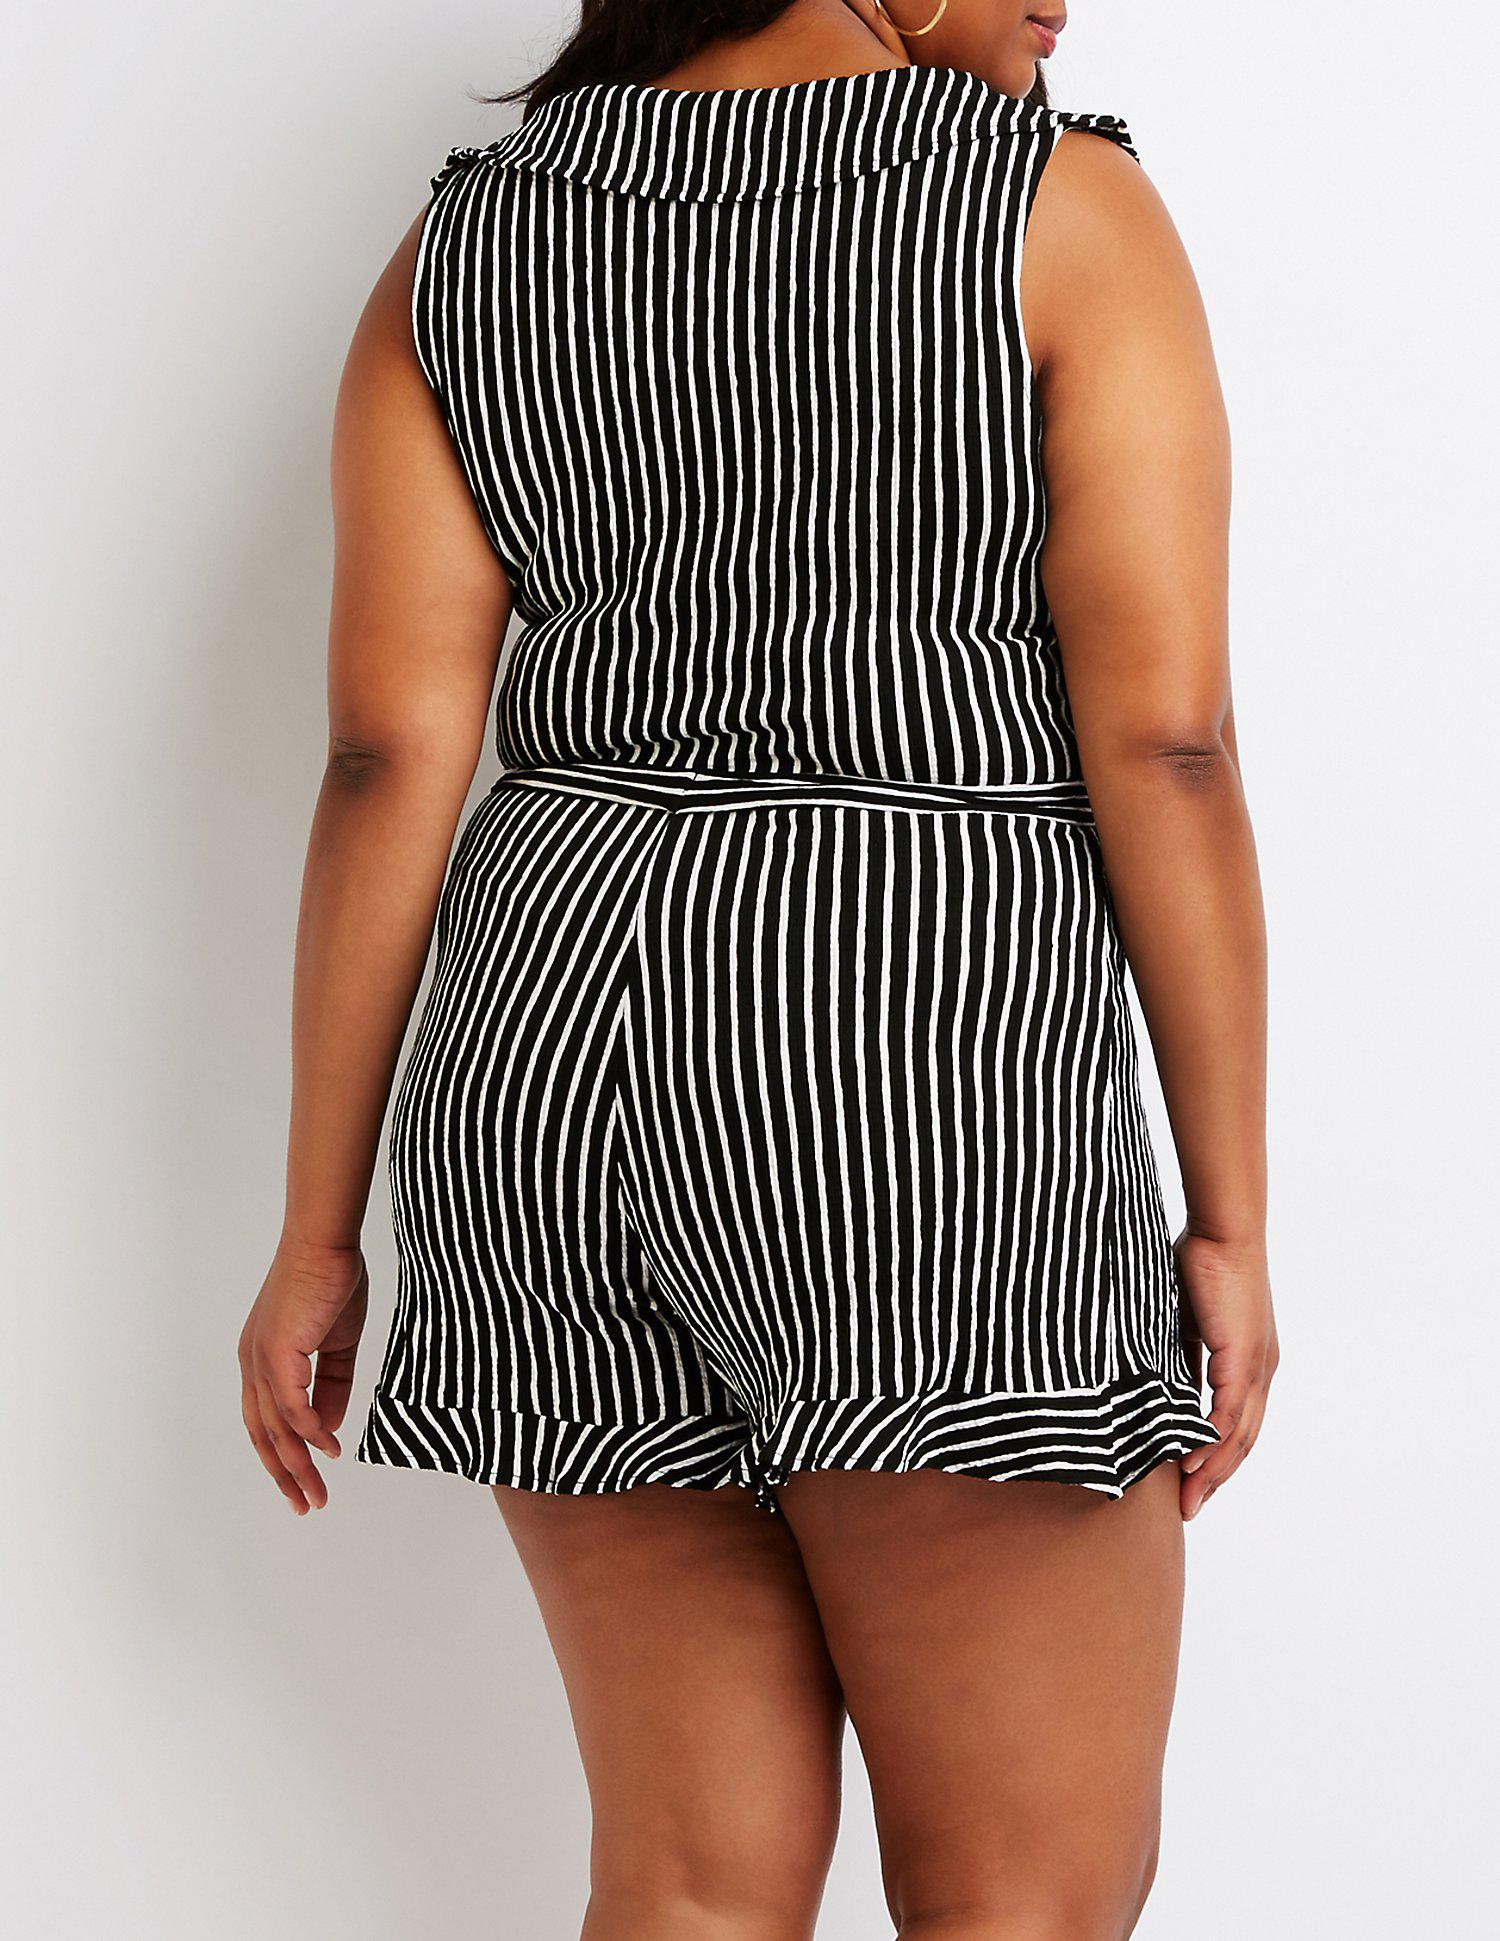 7a65af5d140 Charlotte Russe - Black Plus Size Striped Wrap Romper - Lyst. View  fullscreen